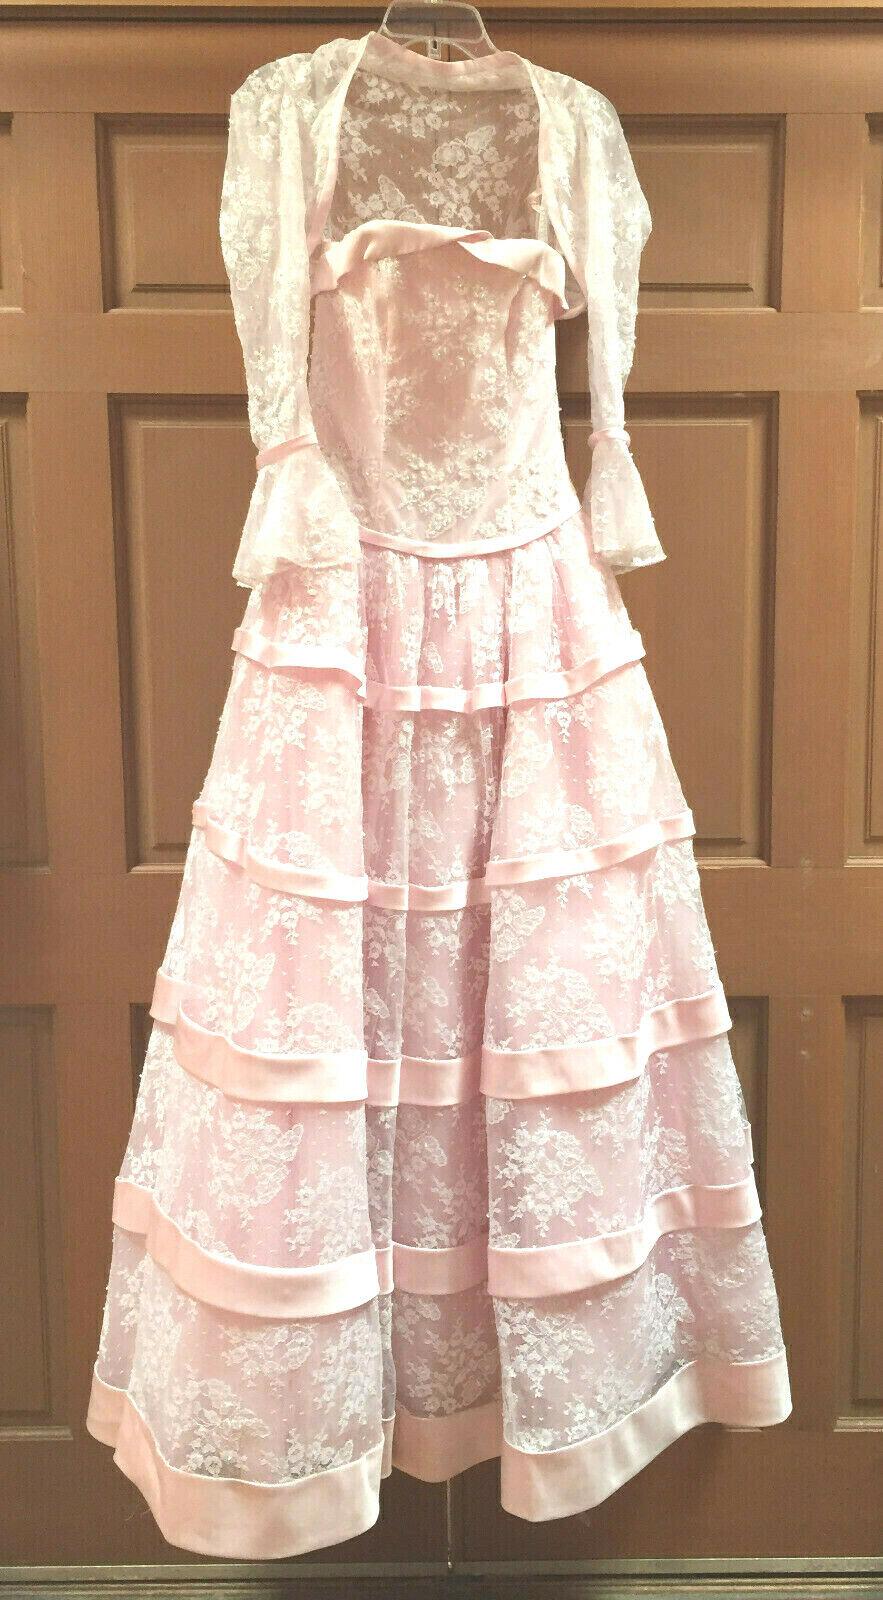 Marys Bridal PC Wedding Gown Women's Bolero Formal Size 6 Pink White Lace